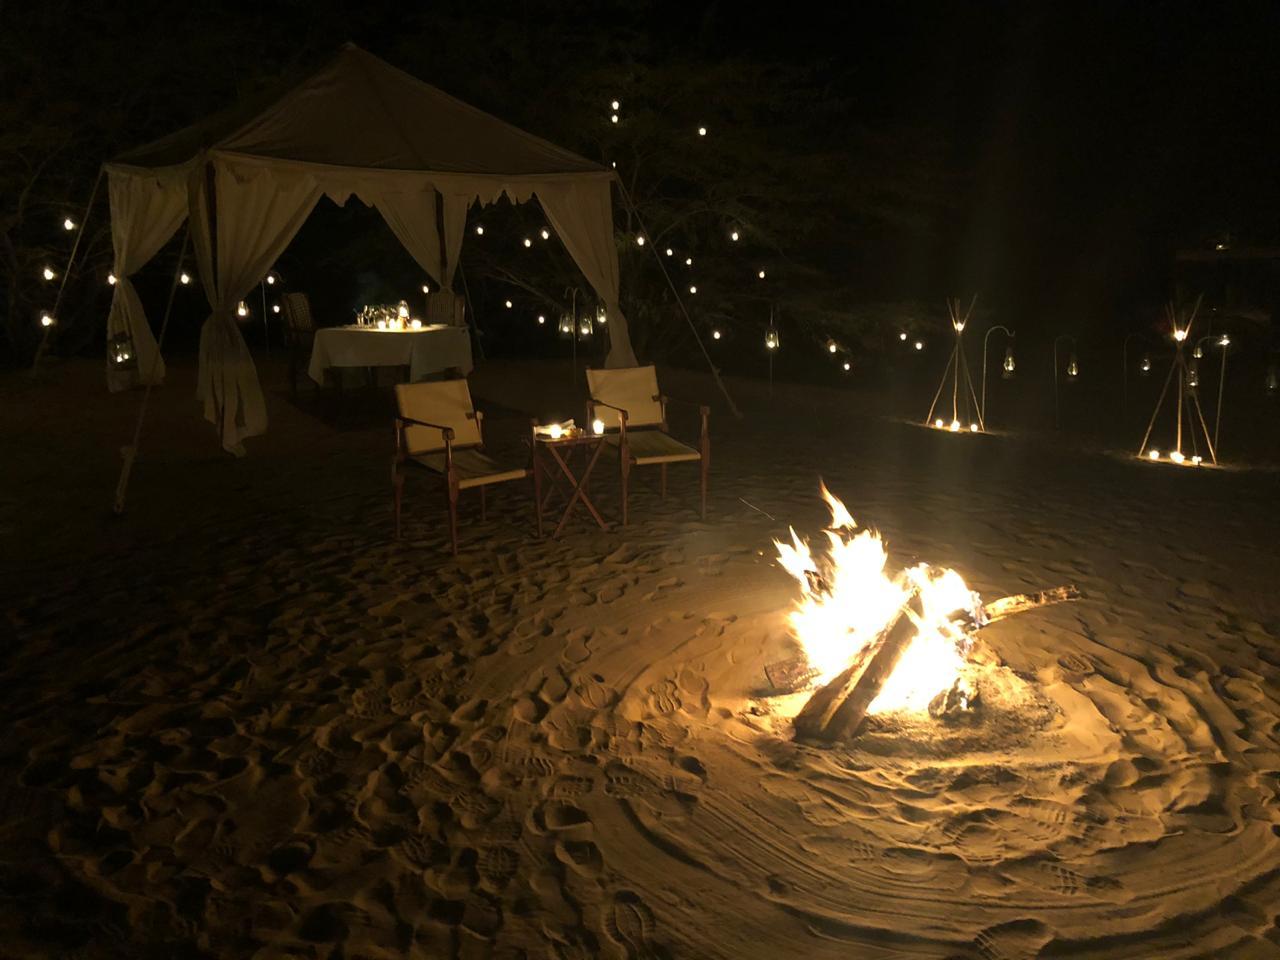 camp fire at Serai, Dinner at Serai, serai sujan jaisalmer, sujan the serai jaisalmer, the serai jaisalmer, The Serai Sujan,